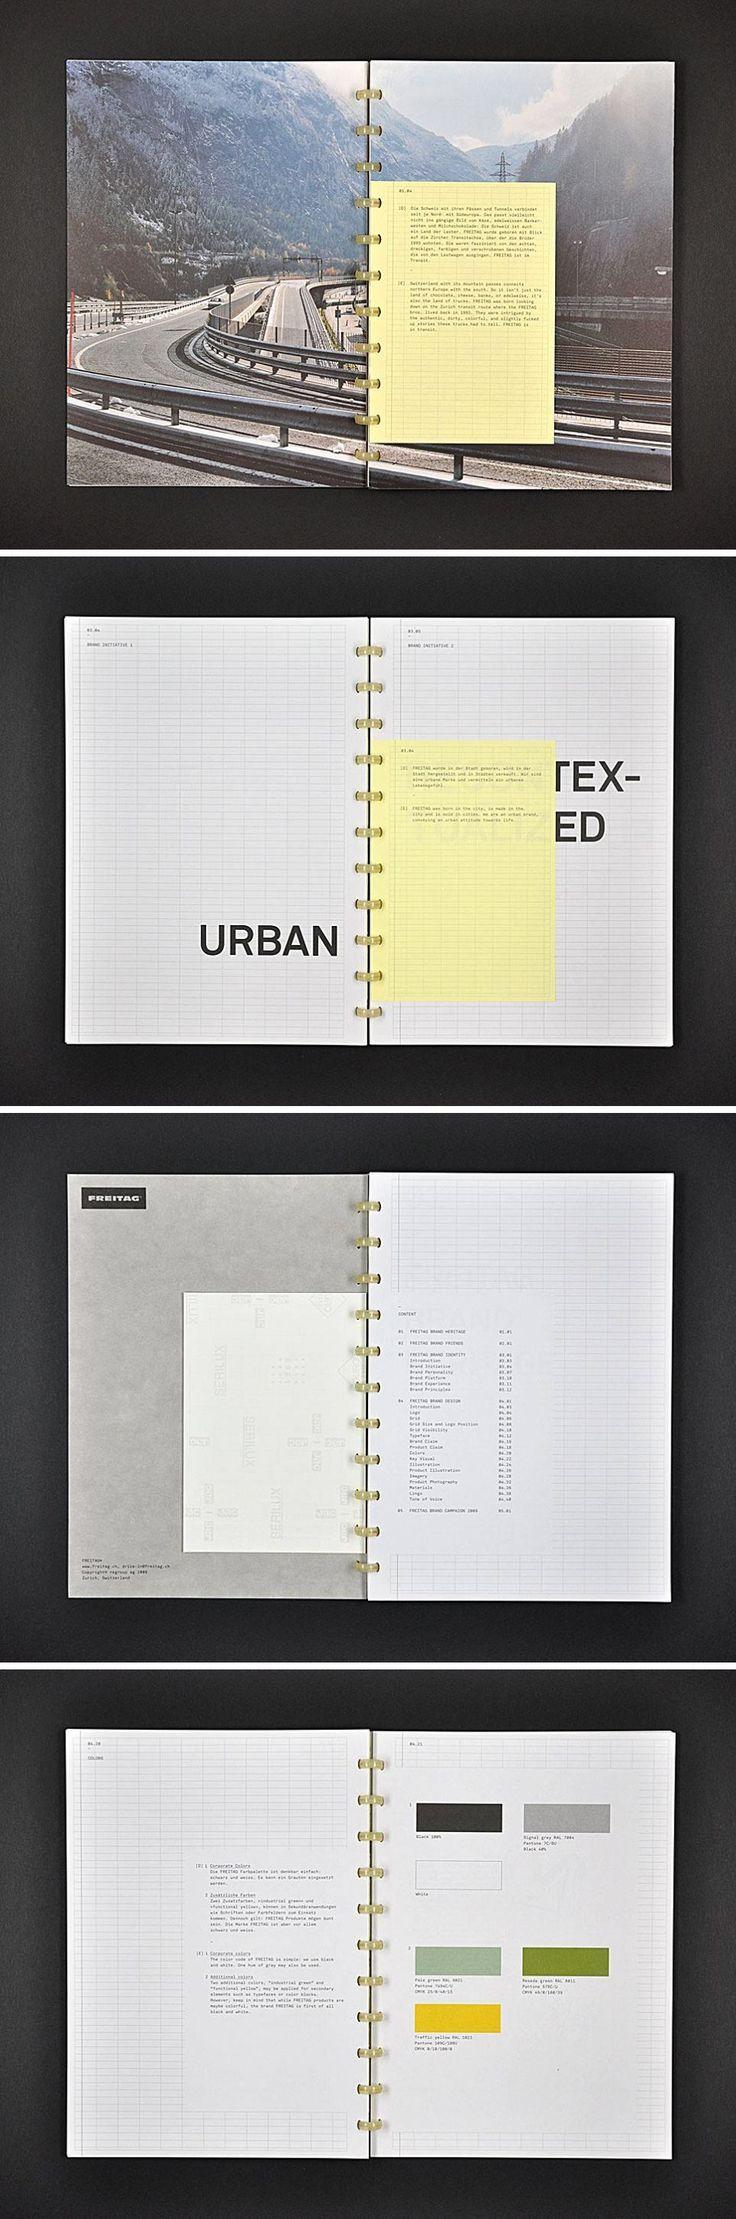 design page artiste cv